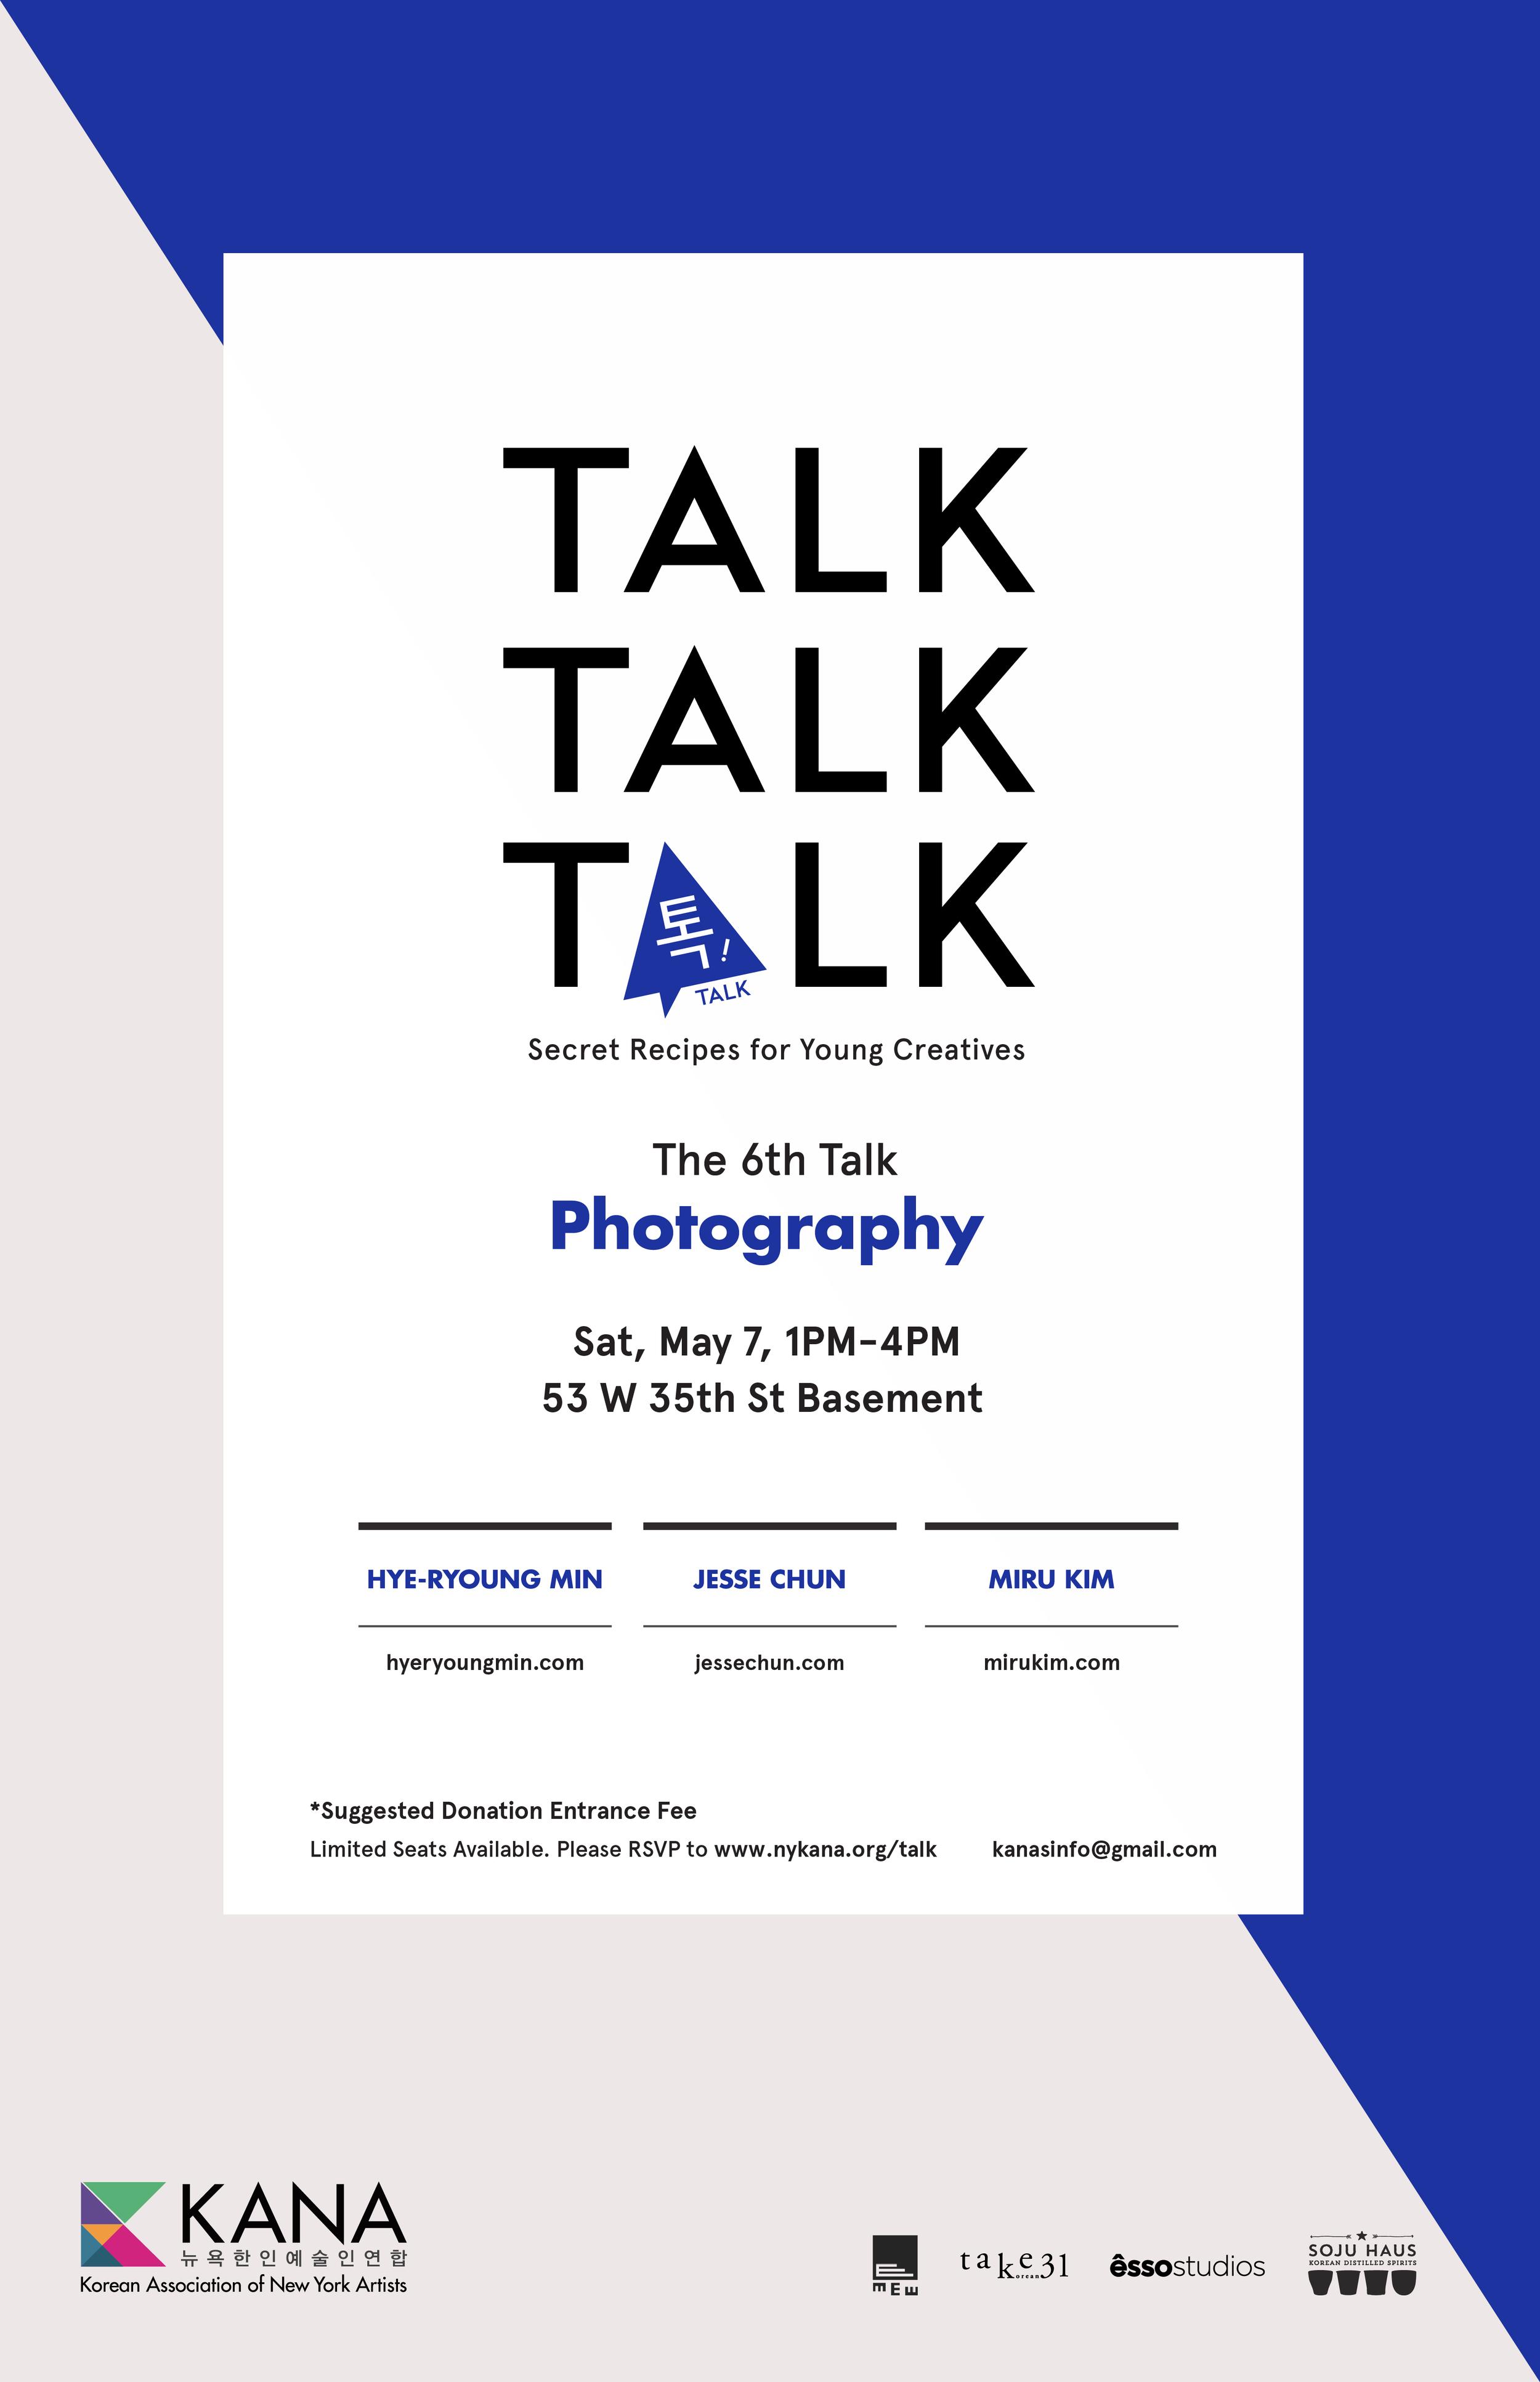 Talk_ARCHITECTURE_v3_RGB_CP_FINAL-01.jpg